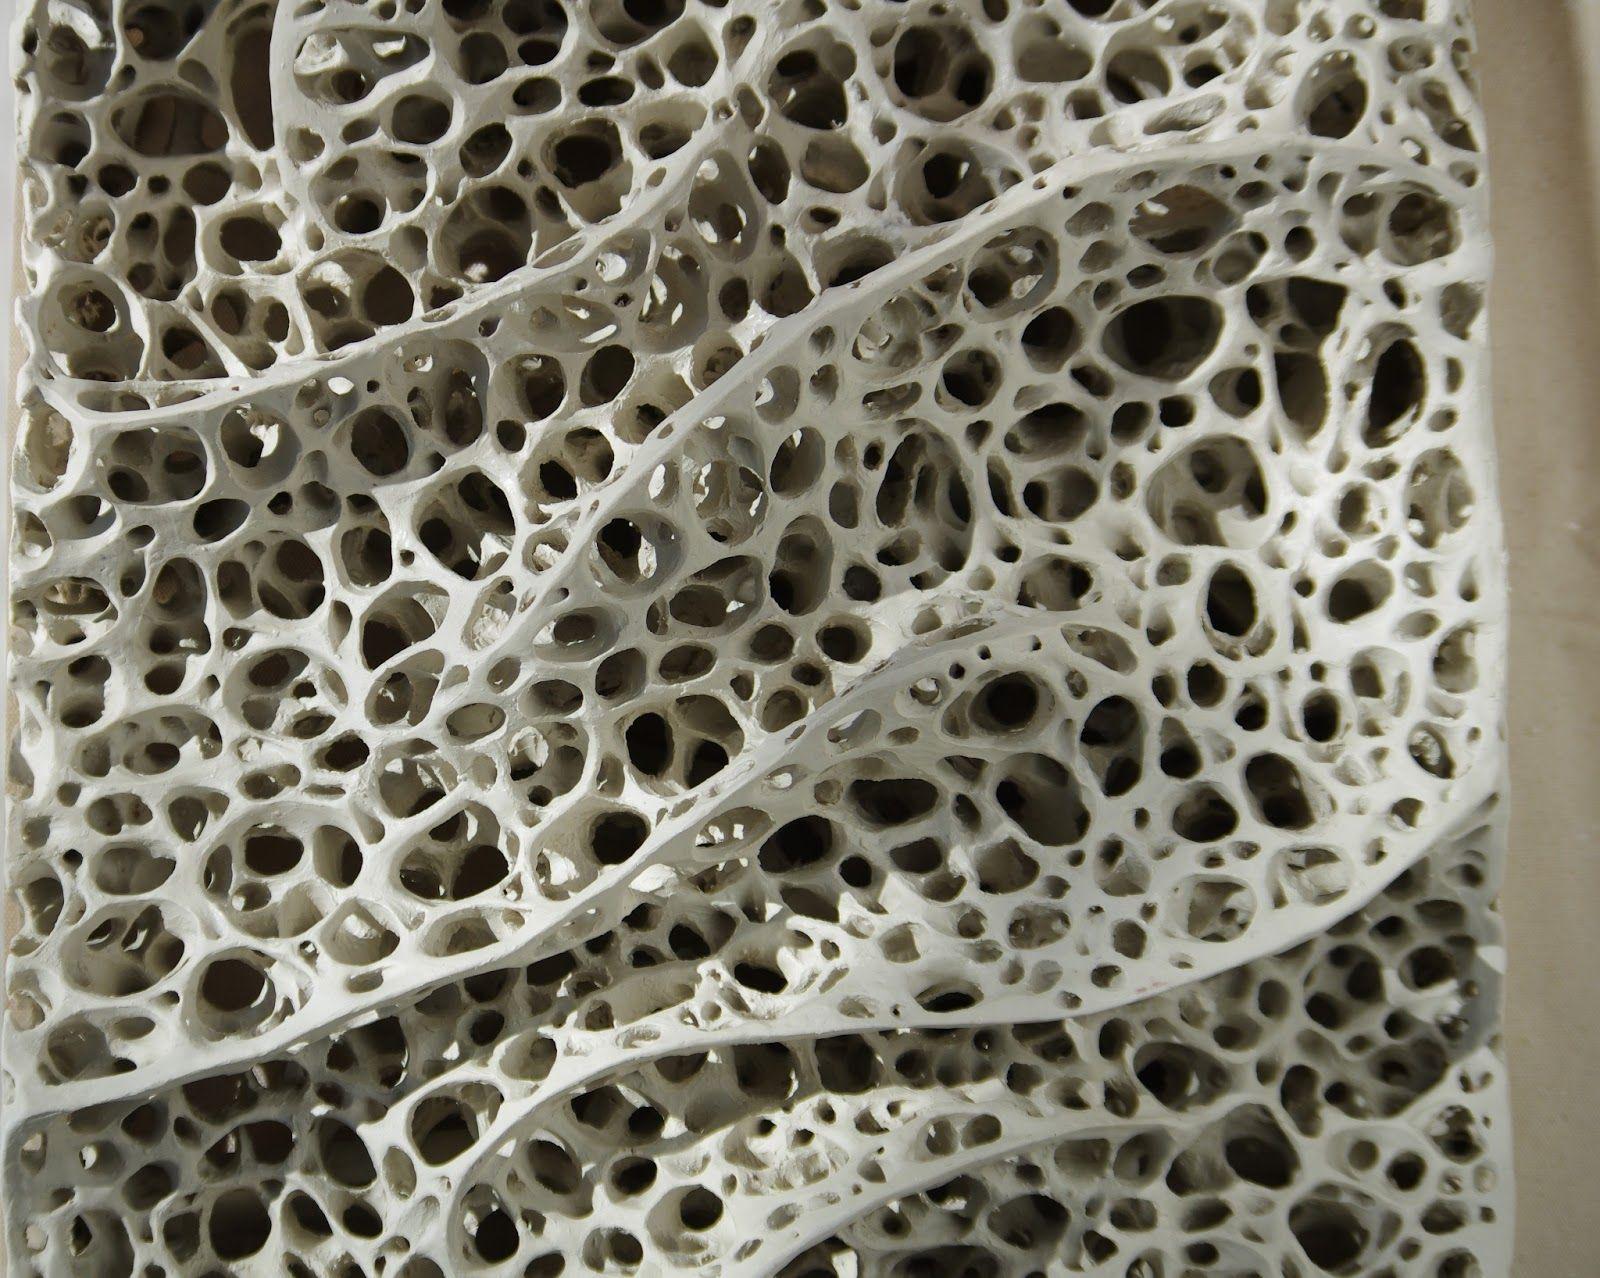 nature of cortical bone The composite nature of haversian  biomechanics of bone:  cortical bone trabecular bone • • • • cylindrical 2.